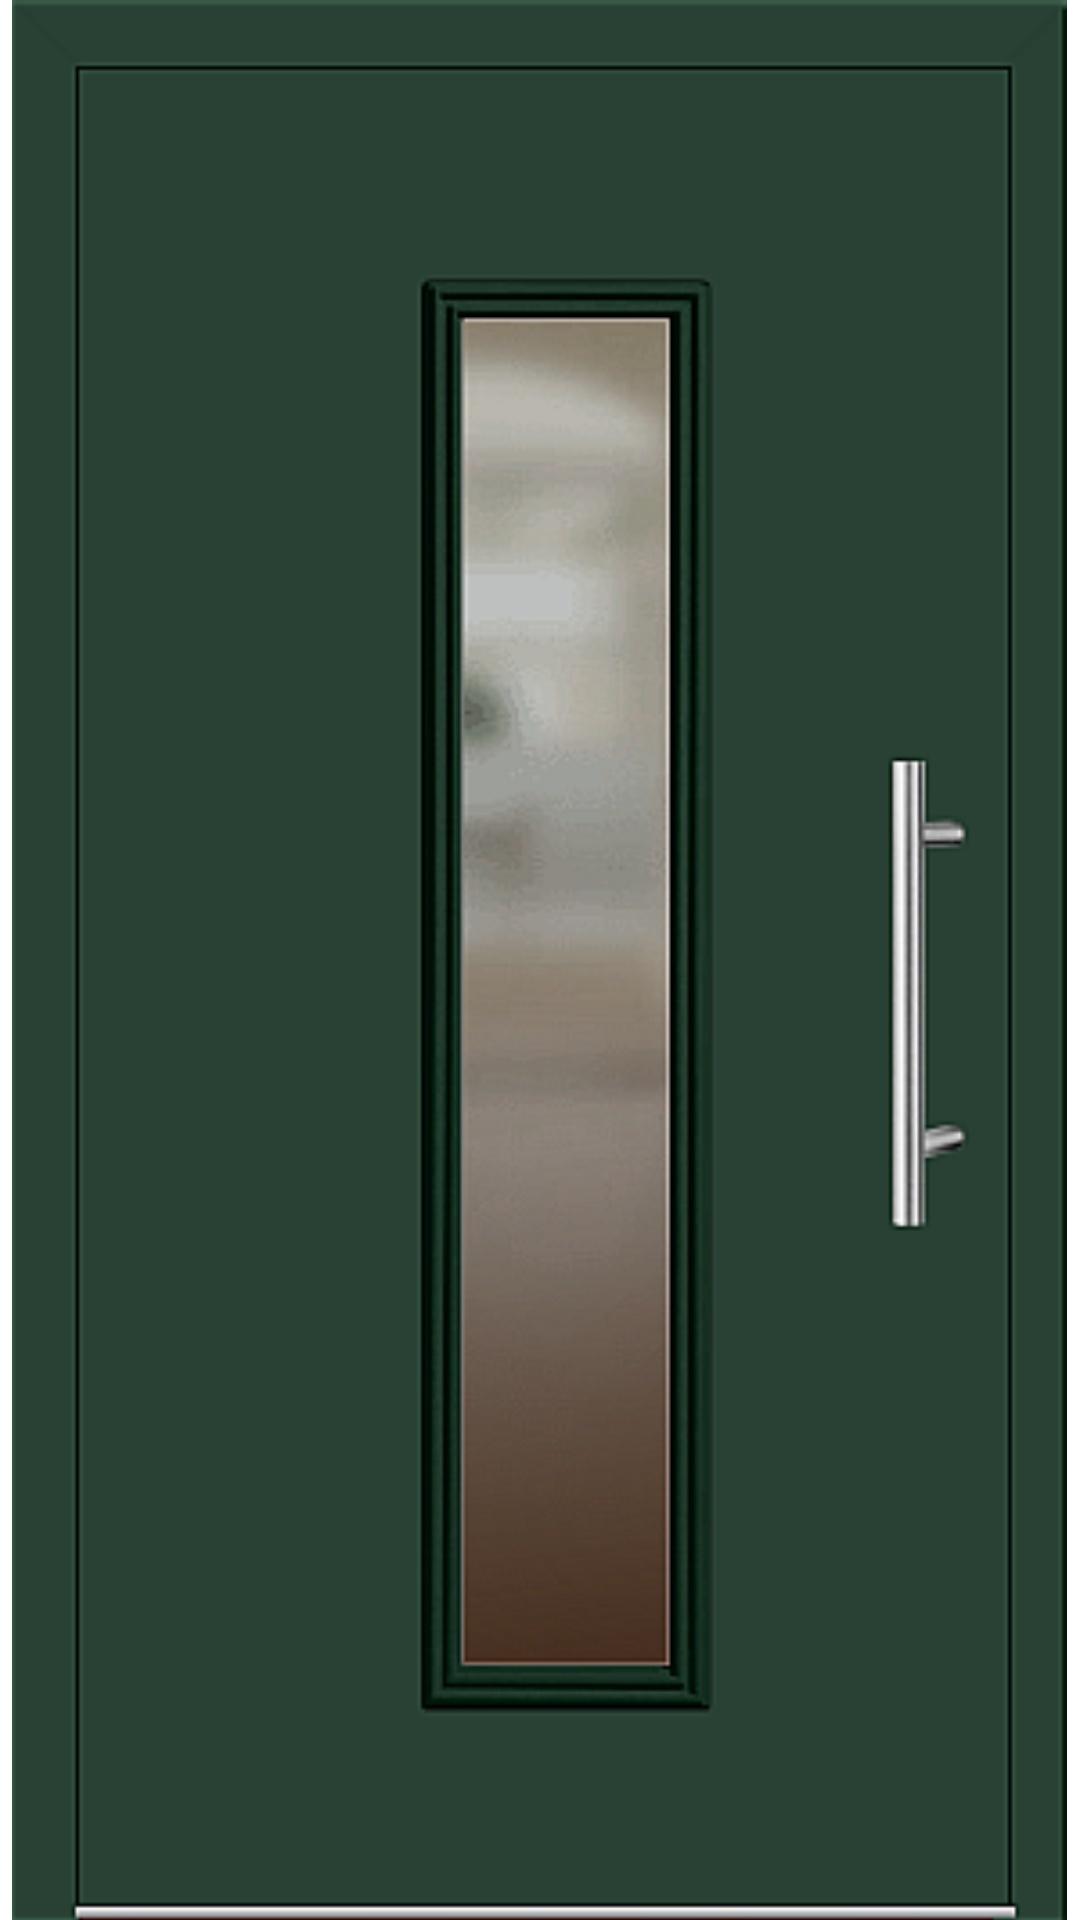 Kunststoff Haustür Modell 6921-60 moosgrün